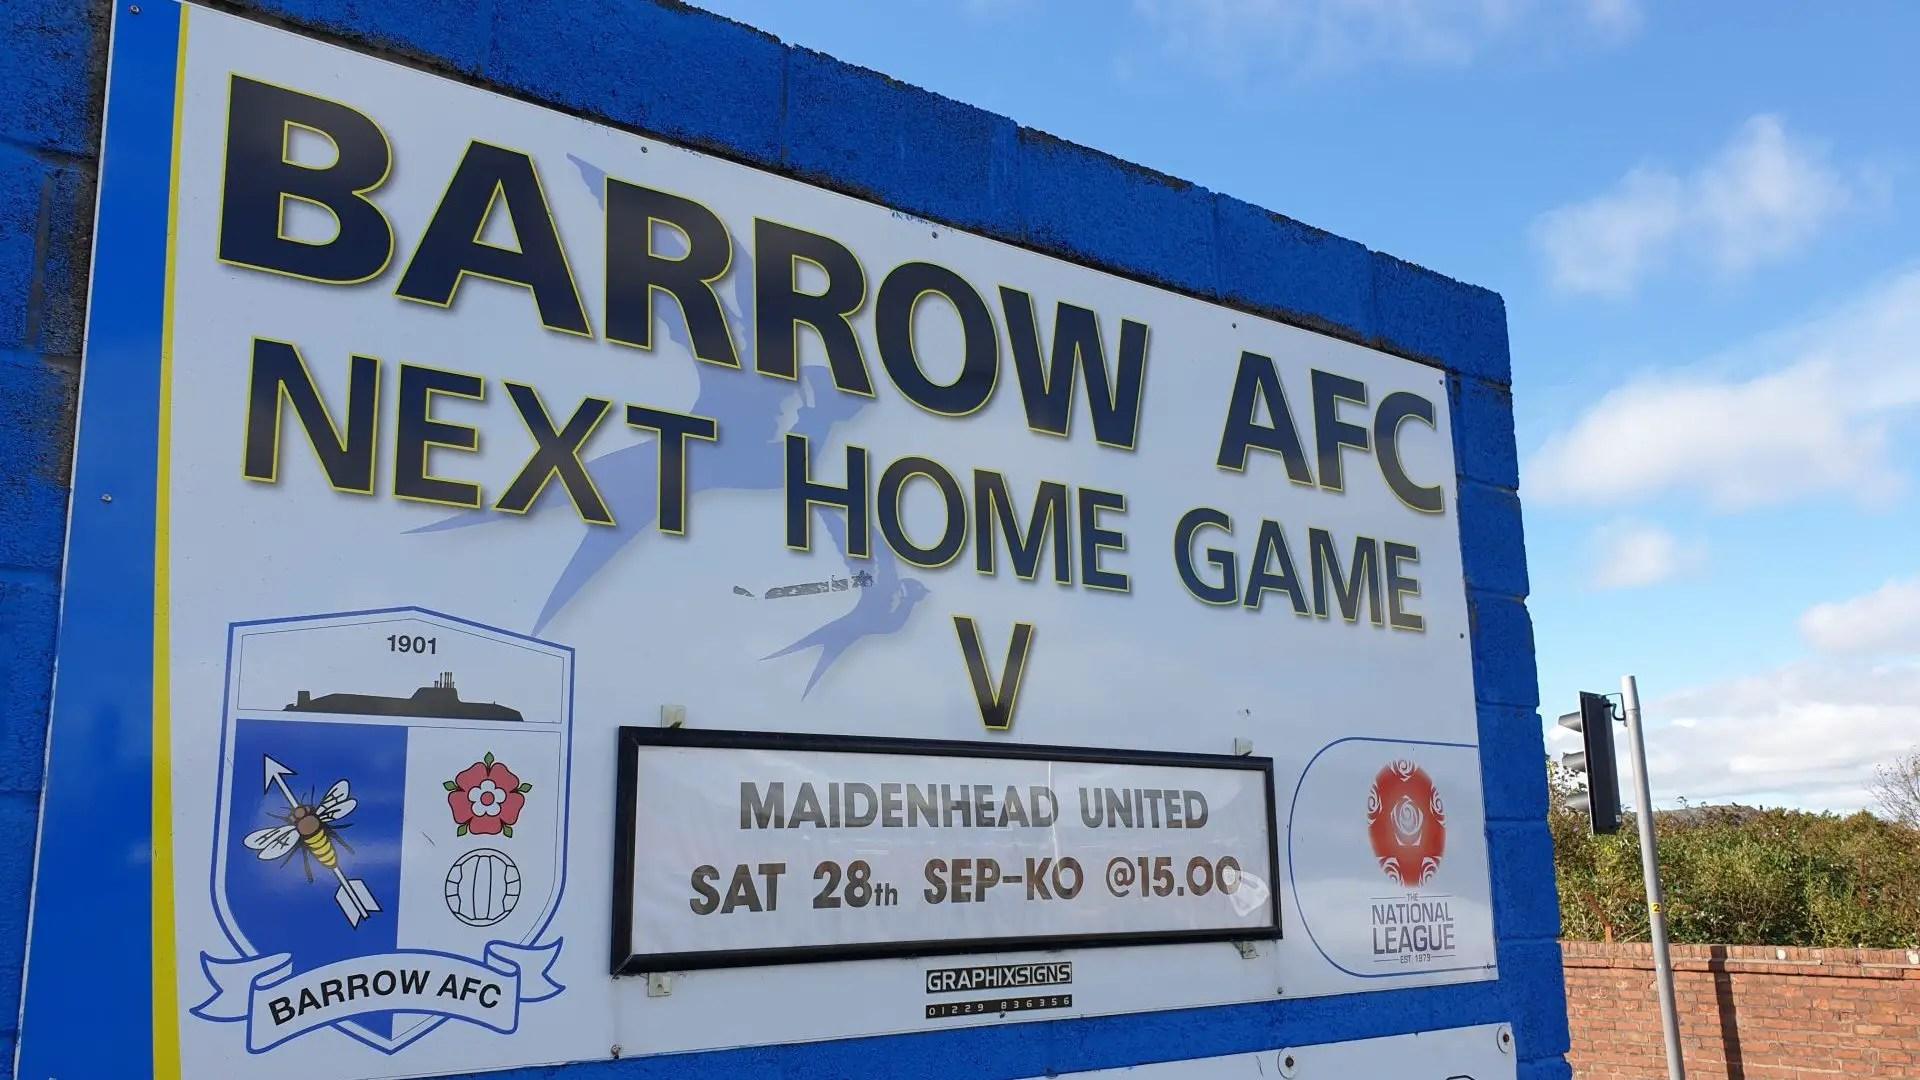 300 miles and dayglo socks – it's Barrow away!